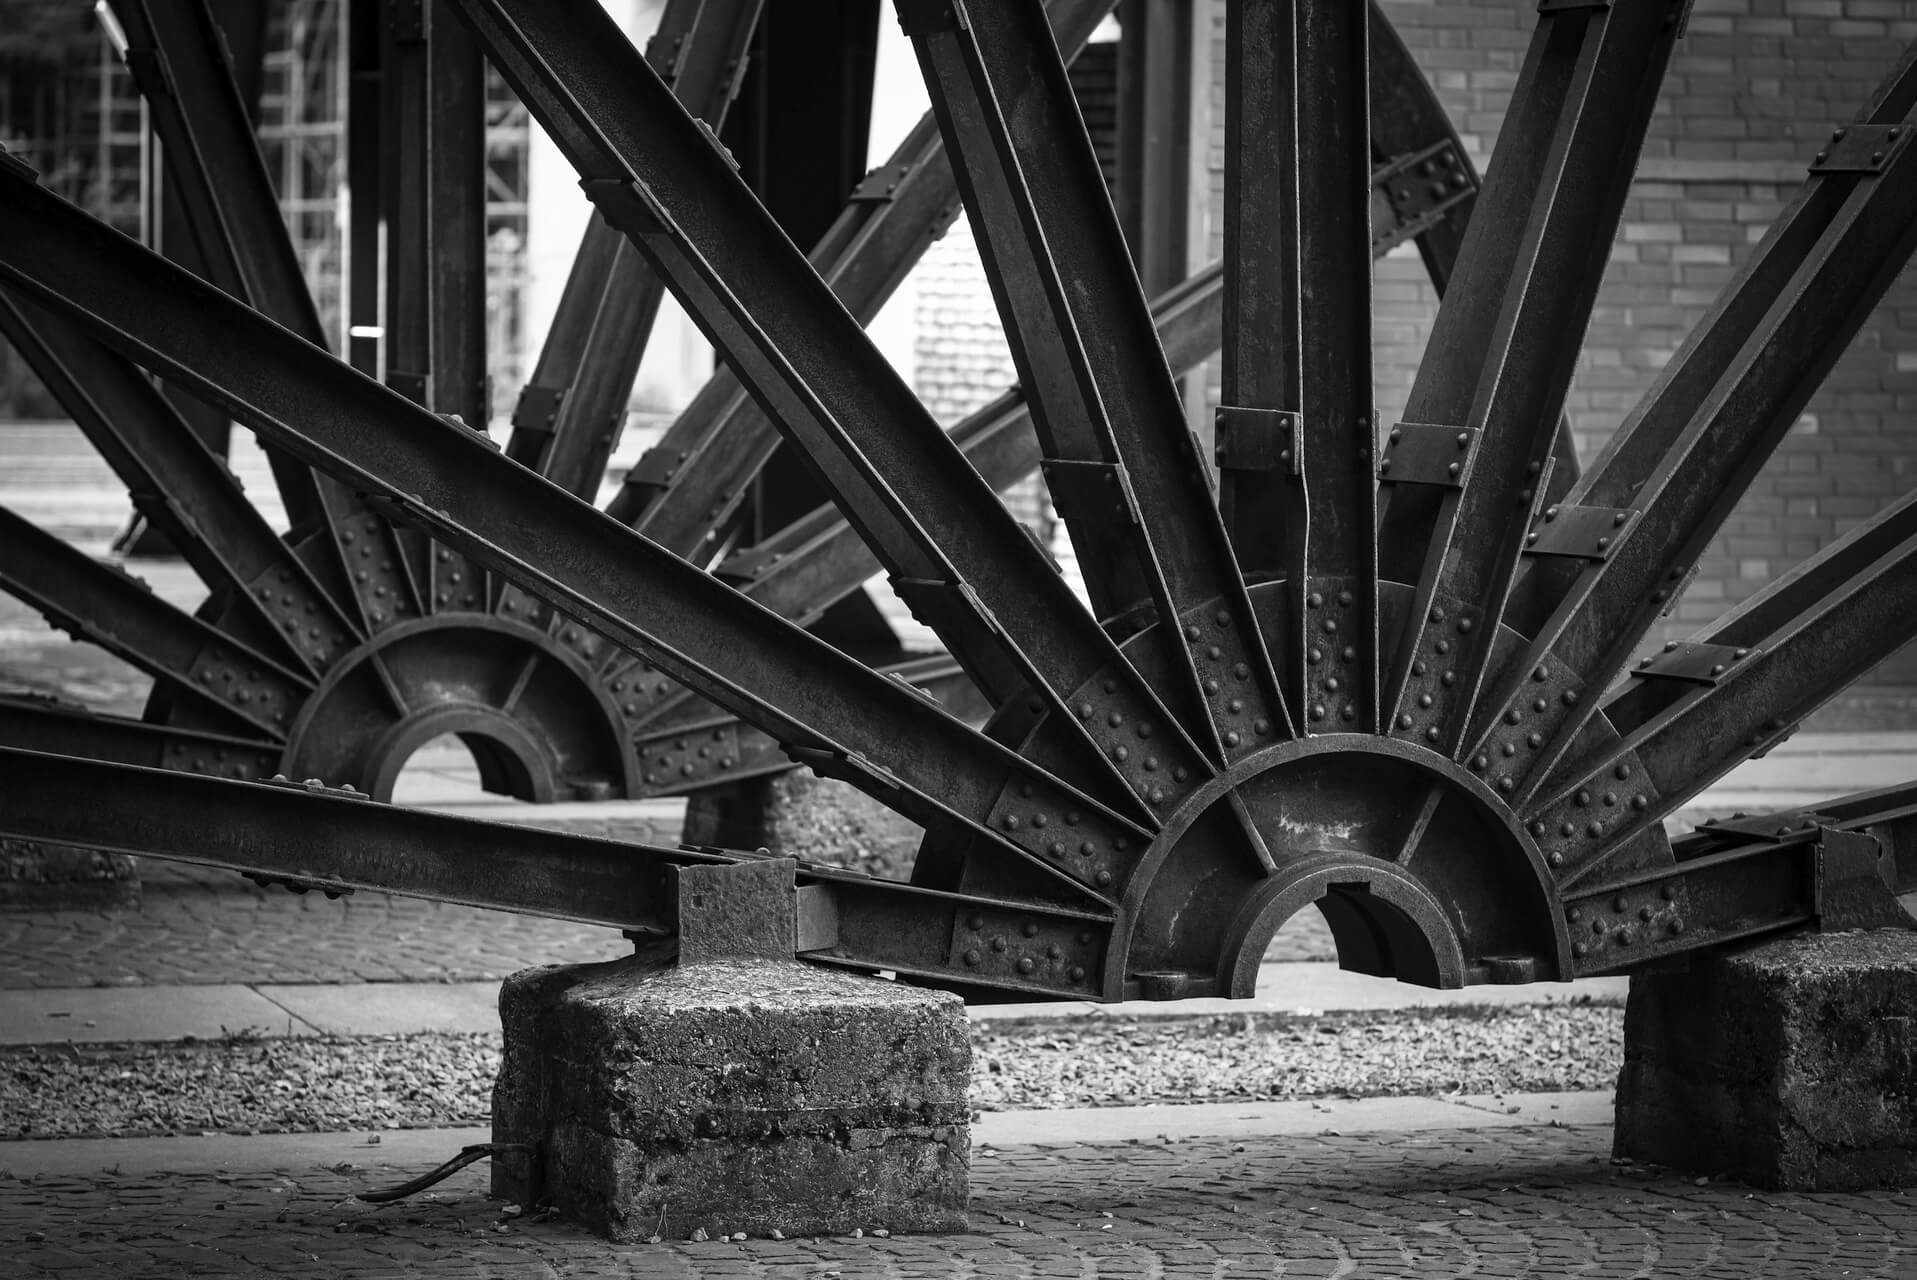 Ruhrgebiet, Industriekultur, Zeche Zollverein, Detail